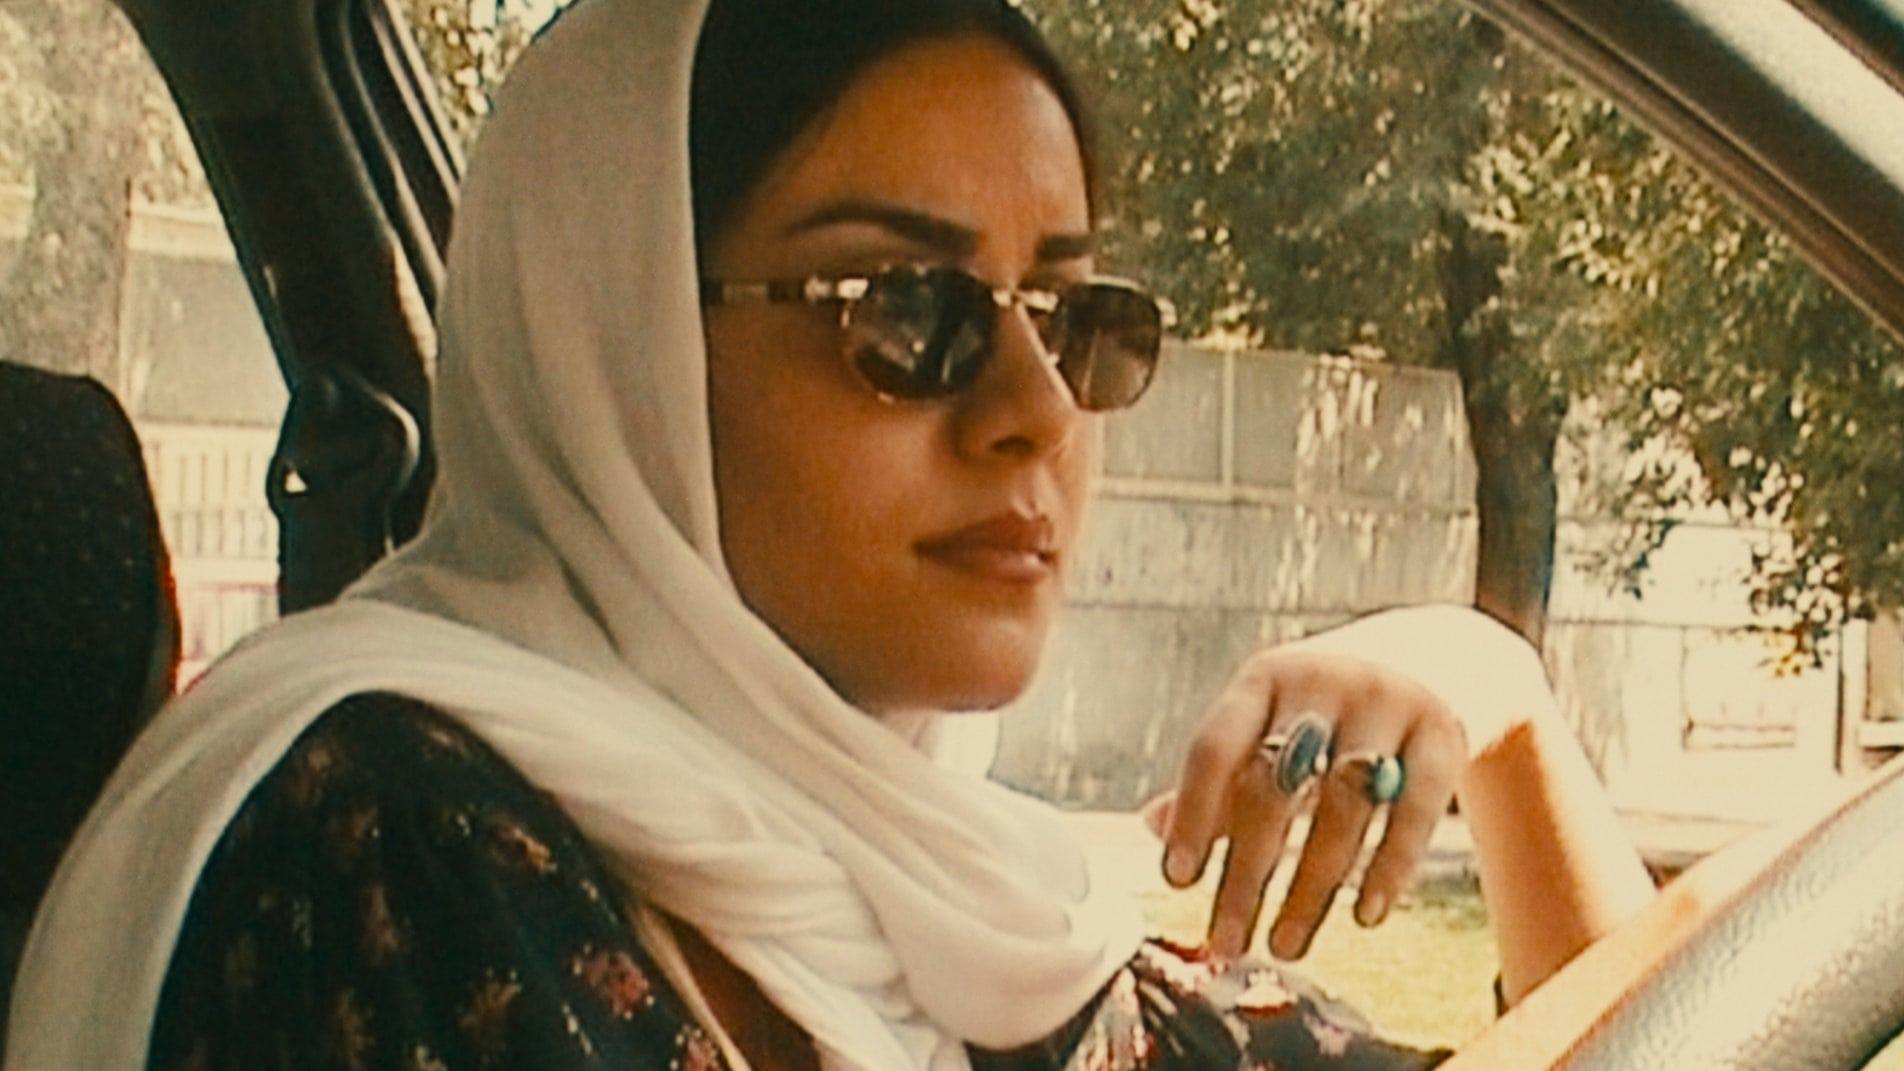 La conductrice (Mania Akbari) au volant de la voiture dans Ten